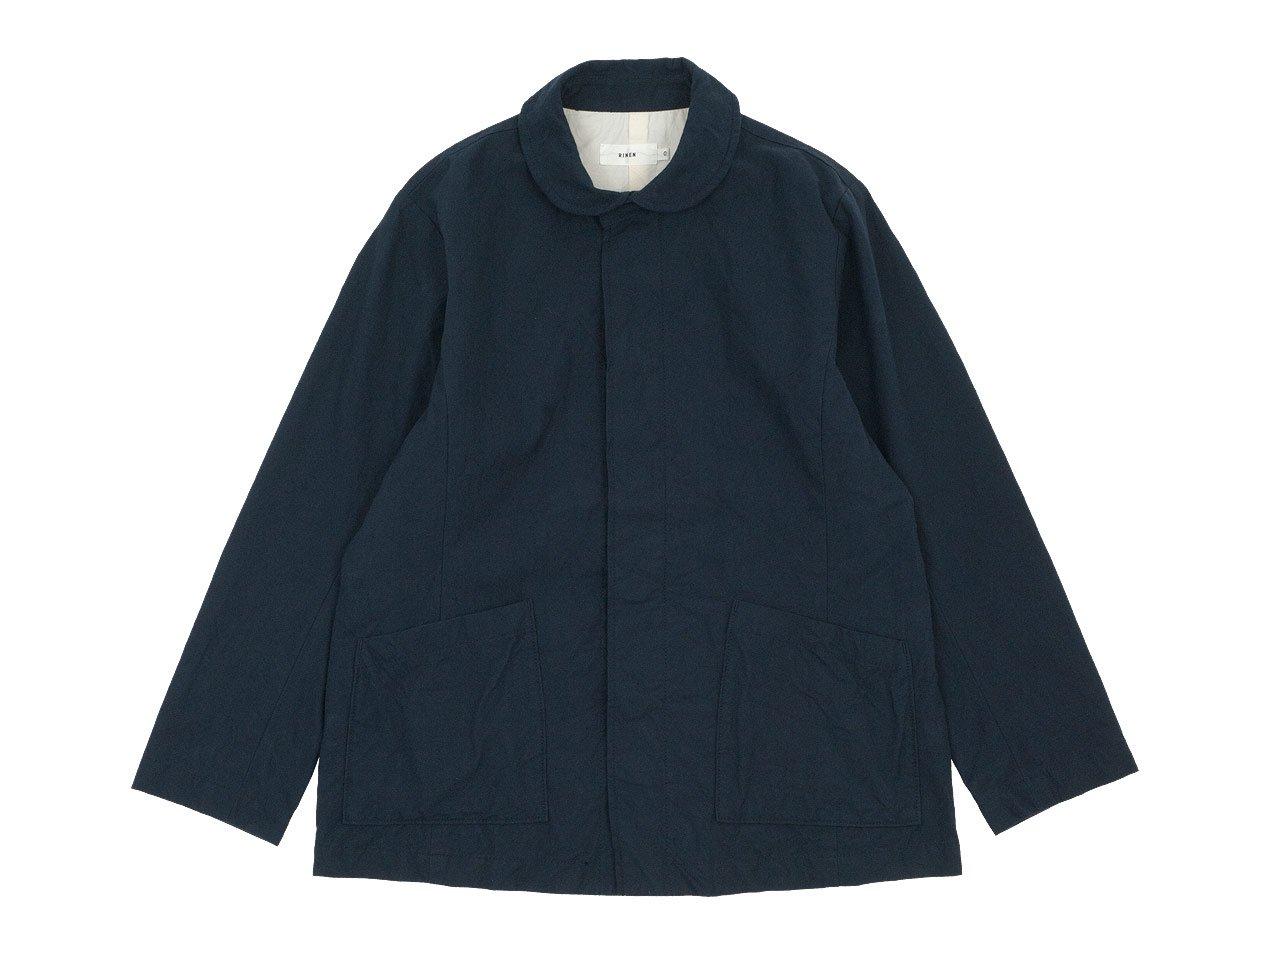 RINEN 40/2高密度平織 ガーデンジャケット 05ネイビー 〔レディース〕